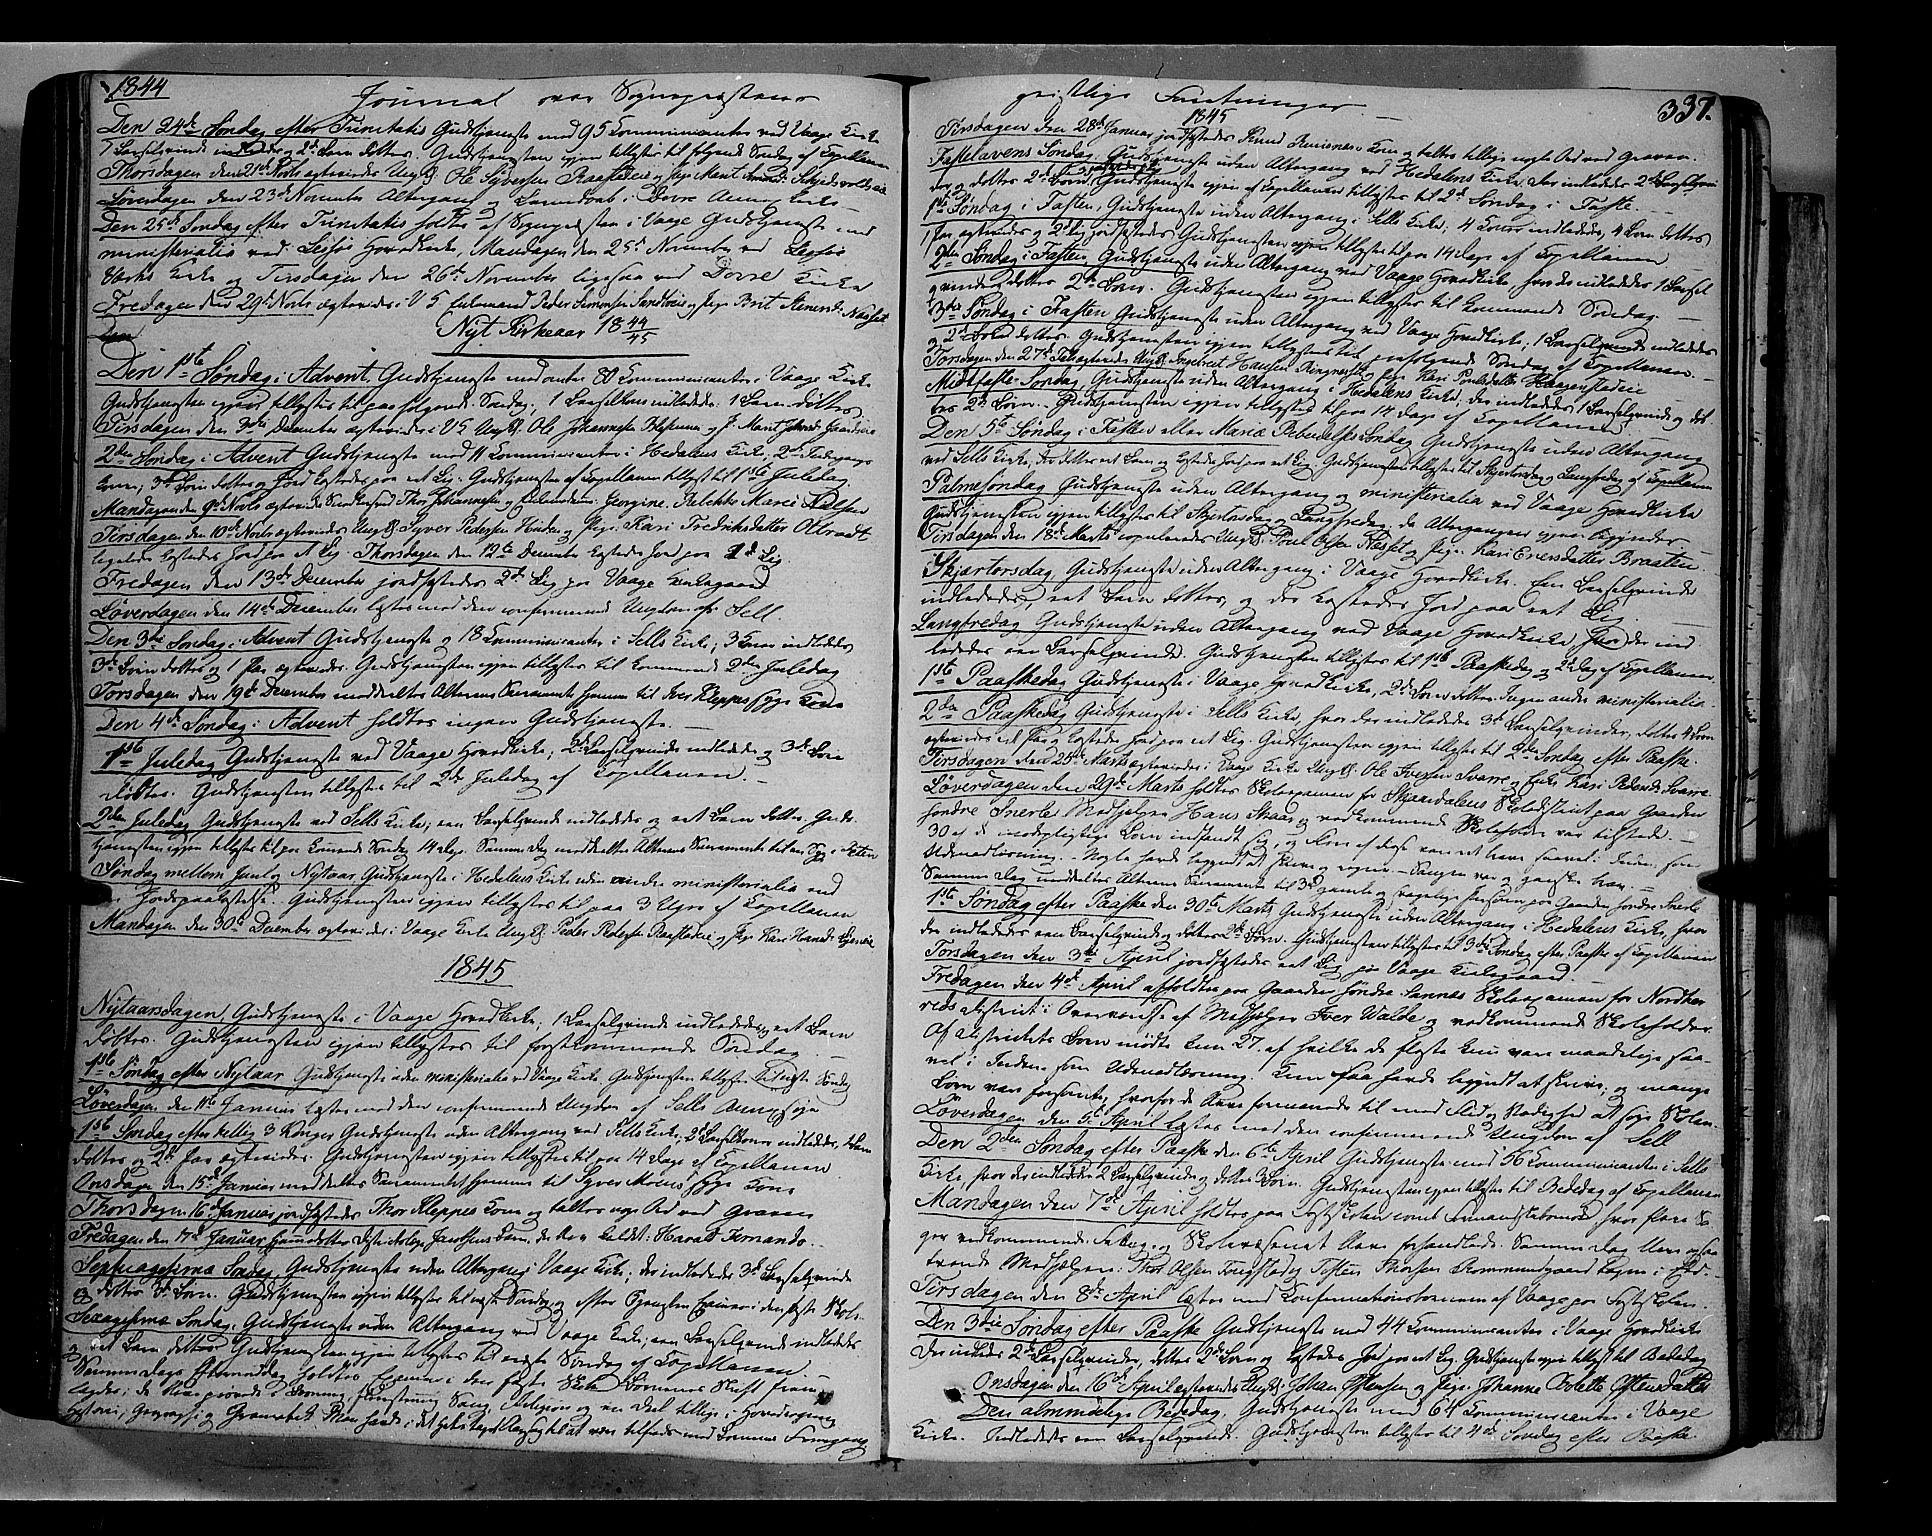 SAH, Vågå prestekontor, Ministerialbok nr. 5 /1, 1842-1856, s. 337